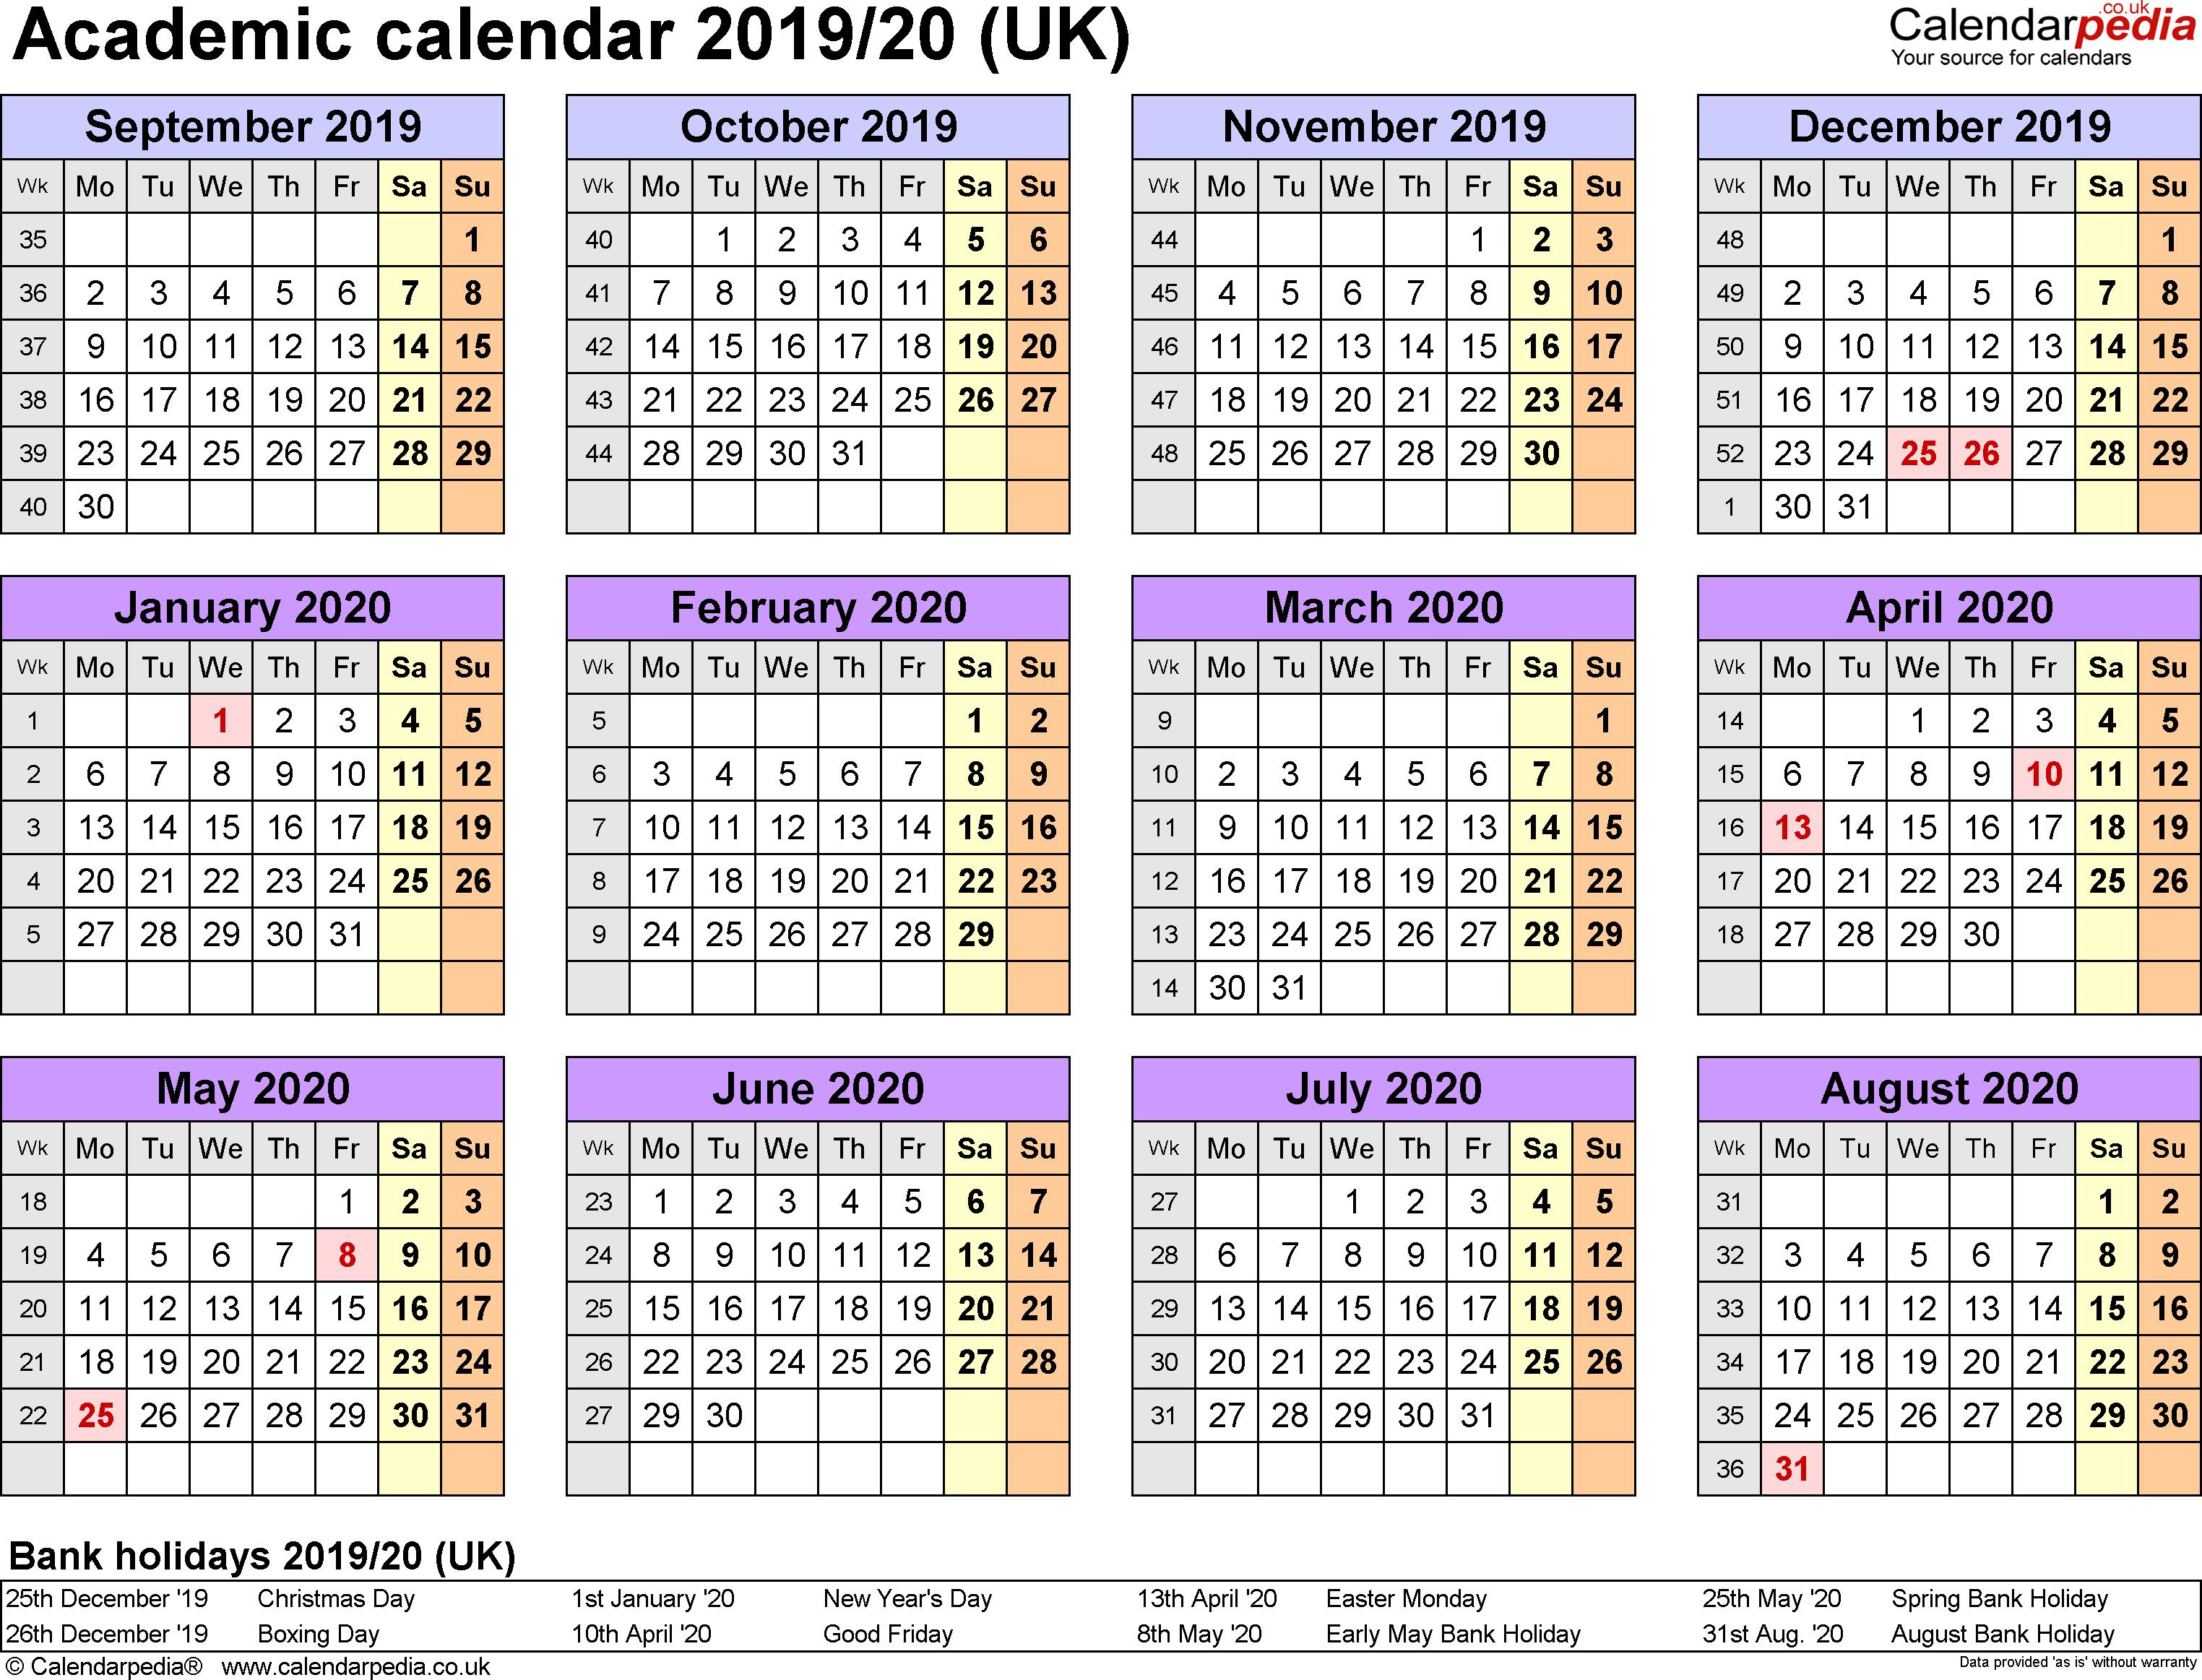 Academic Calendars 2019/2020 As Free Printable Pdf Templates regarding Canadian Printable Academic Calendar 2019-2020